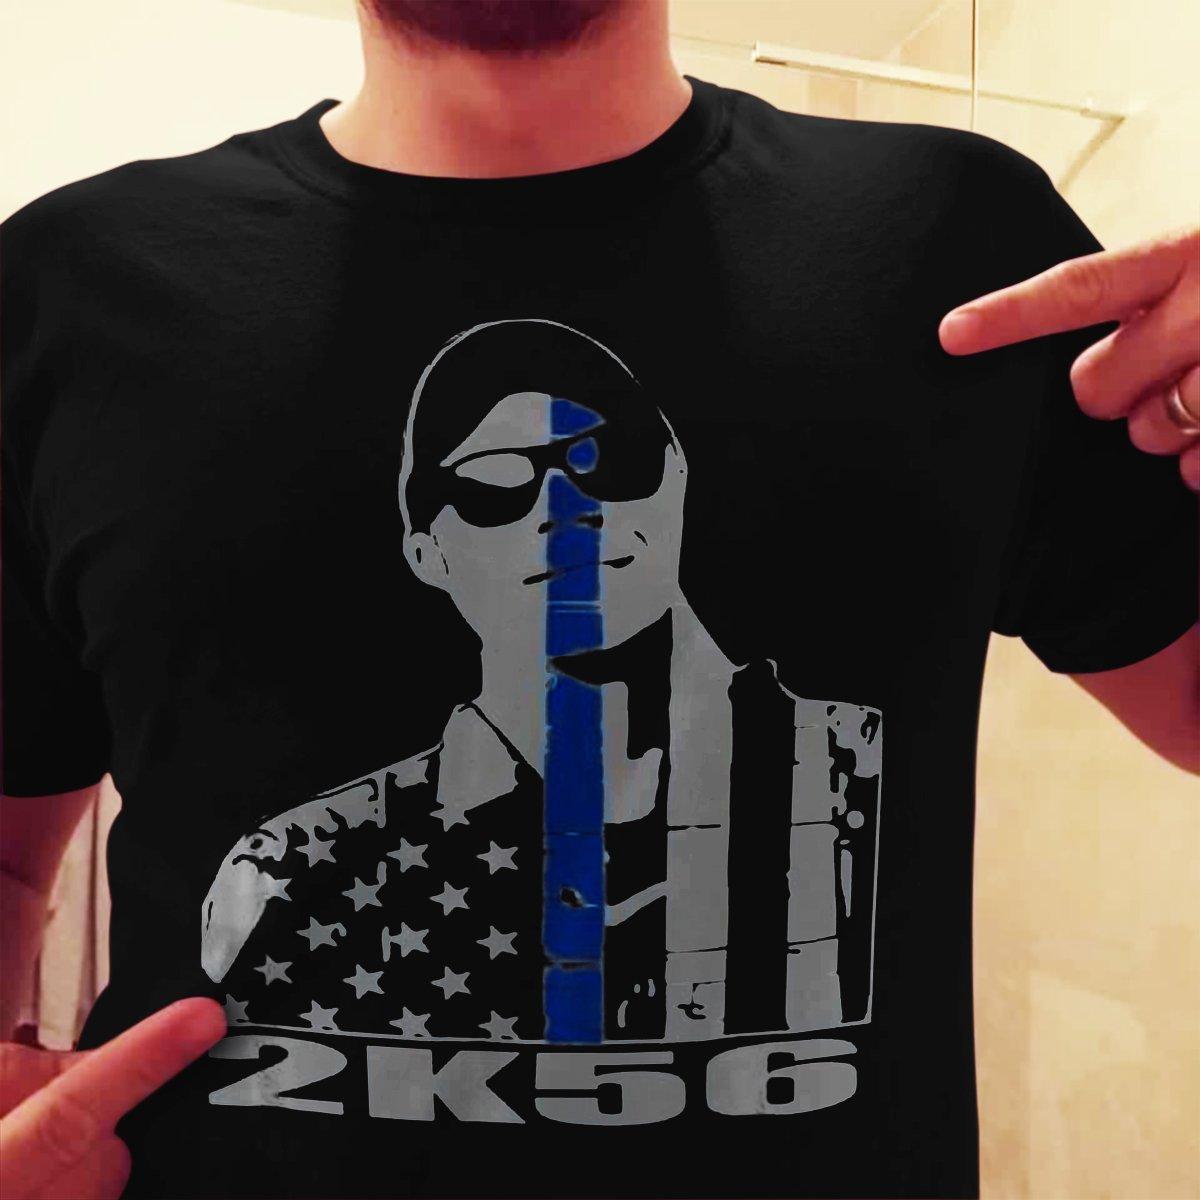 2K56 Officer Diego Shirt